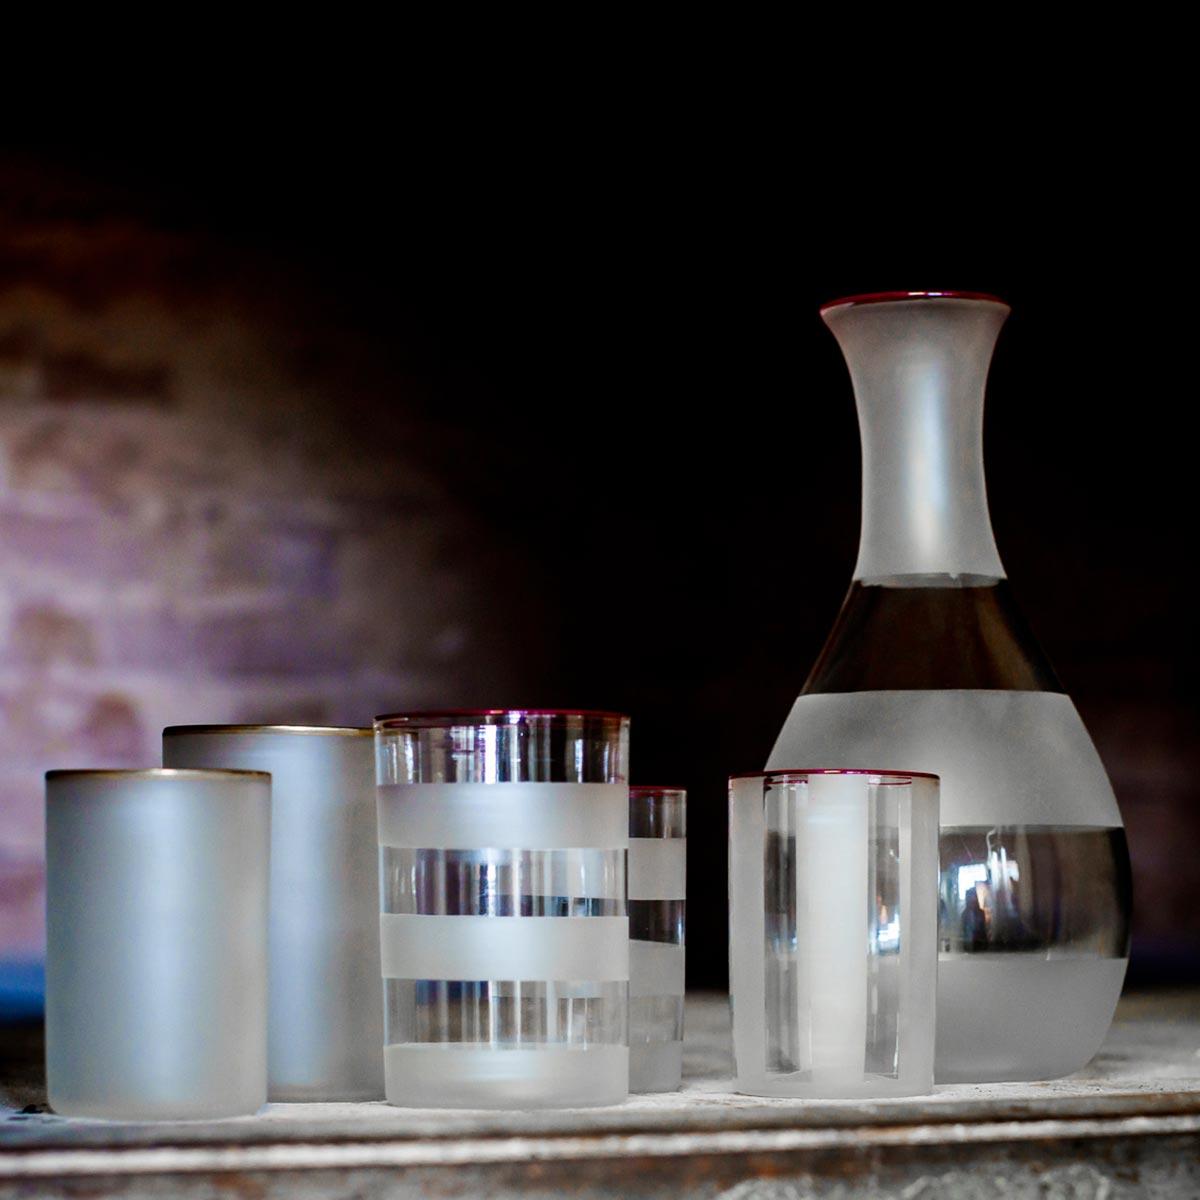 strica jug murano glass giberto design stripped ruby rim water drink luxury modern